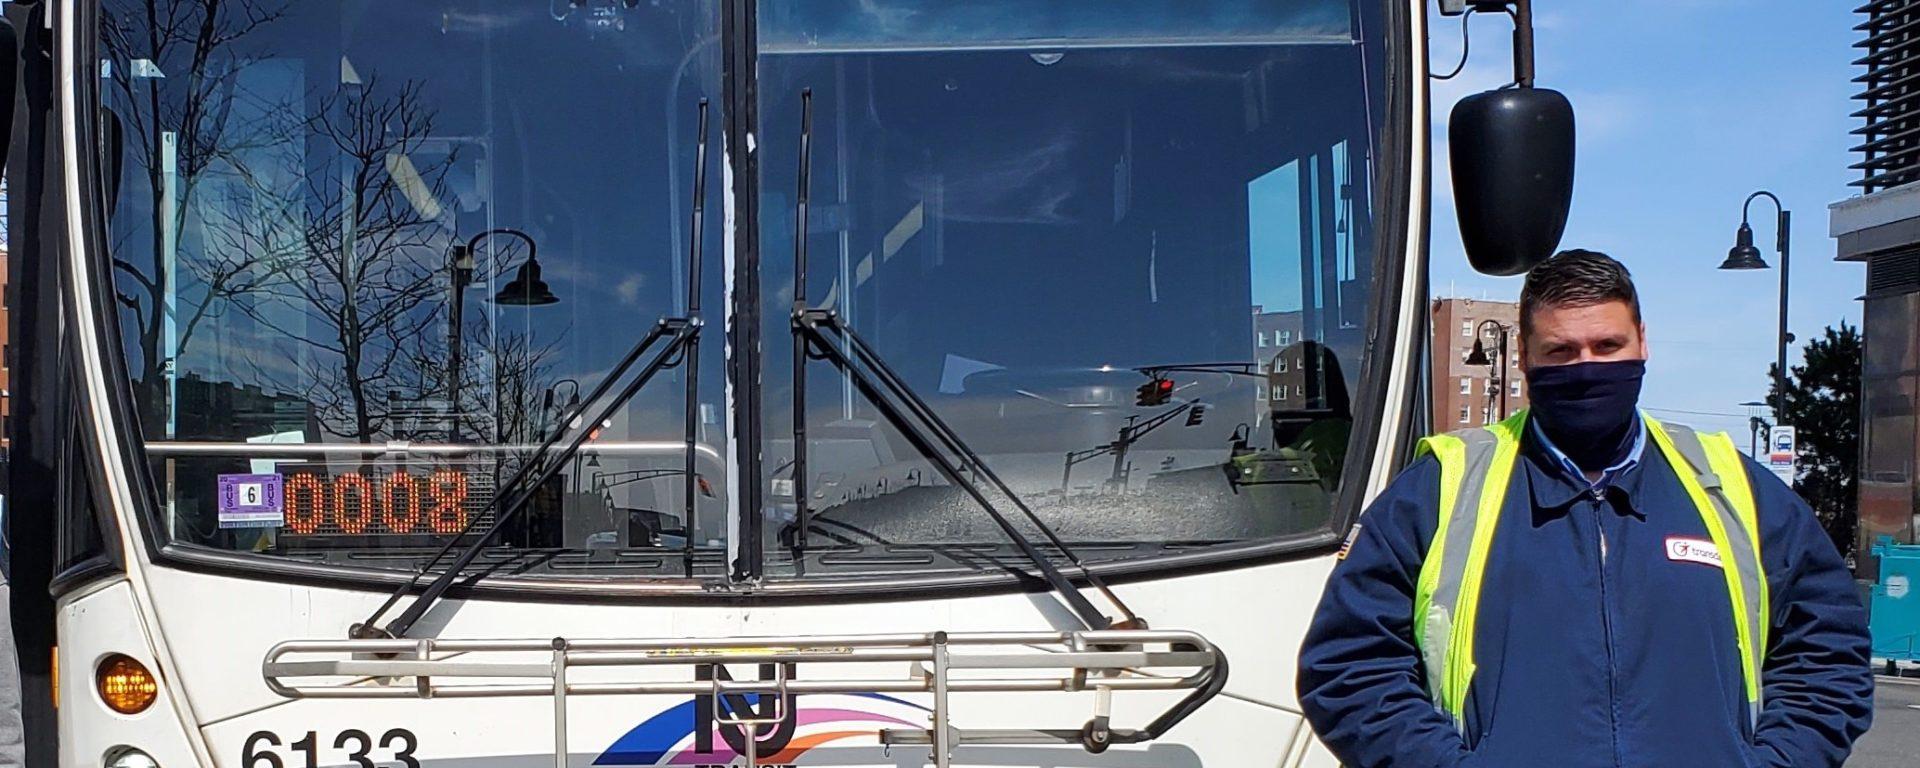 nj-transit-monmouthbusjpg